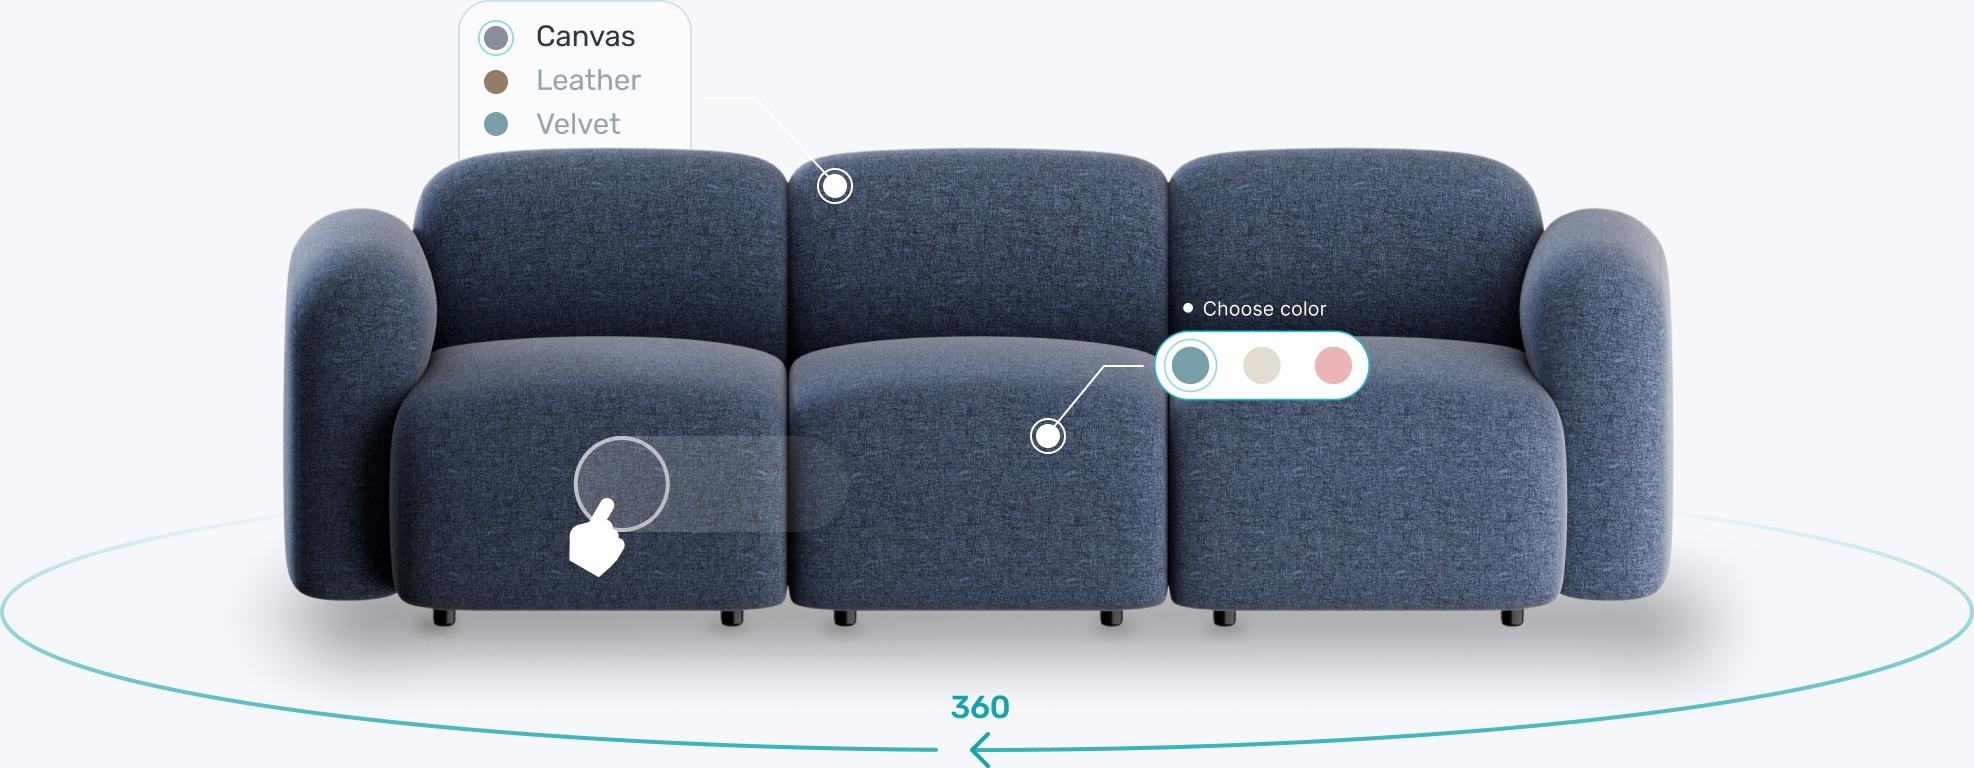 3D sofa image